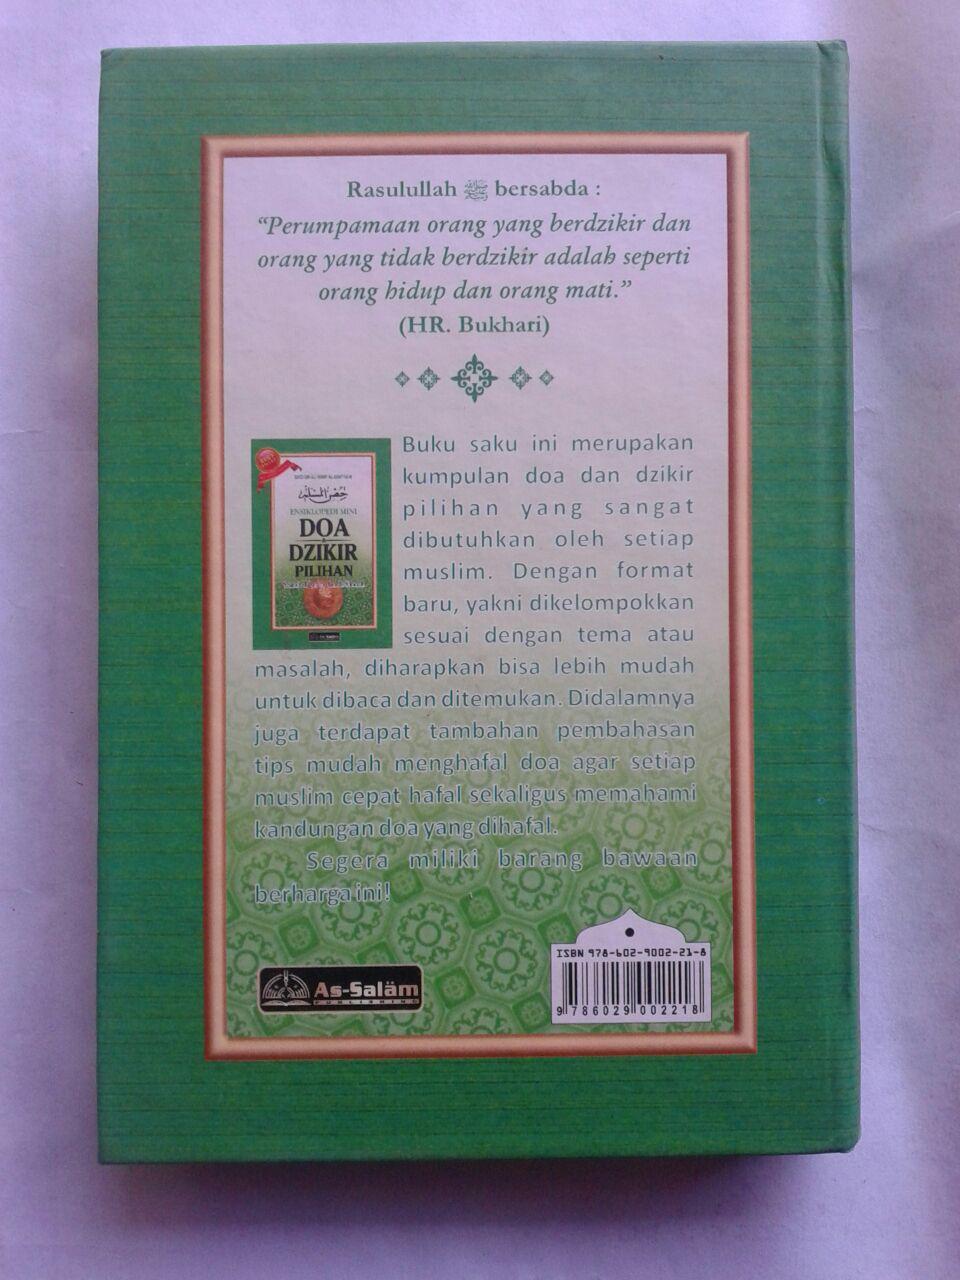 Buku Saku Hisnul Muslim Ensiklopedi Mini Doa & Dzikir Pilihan Cover 2